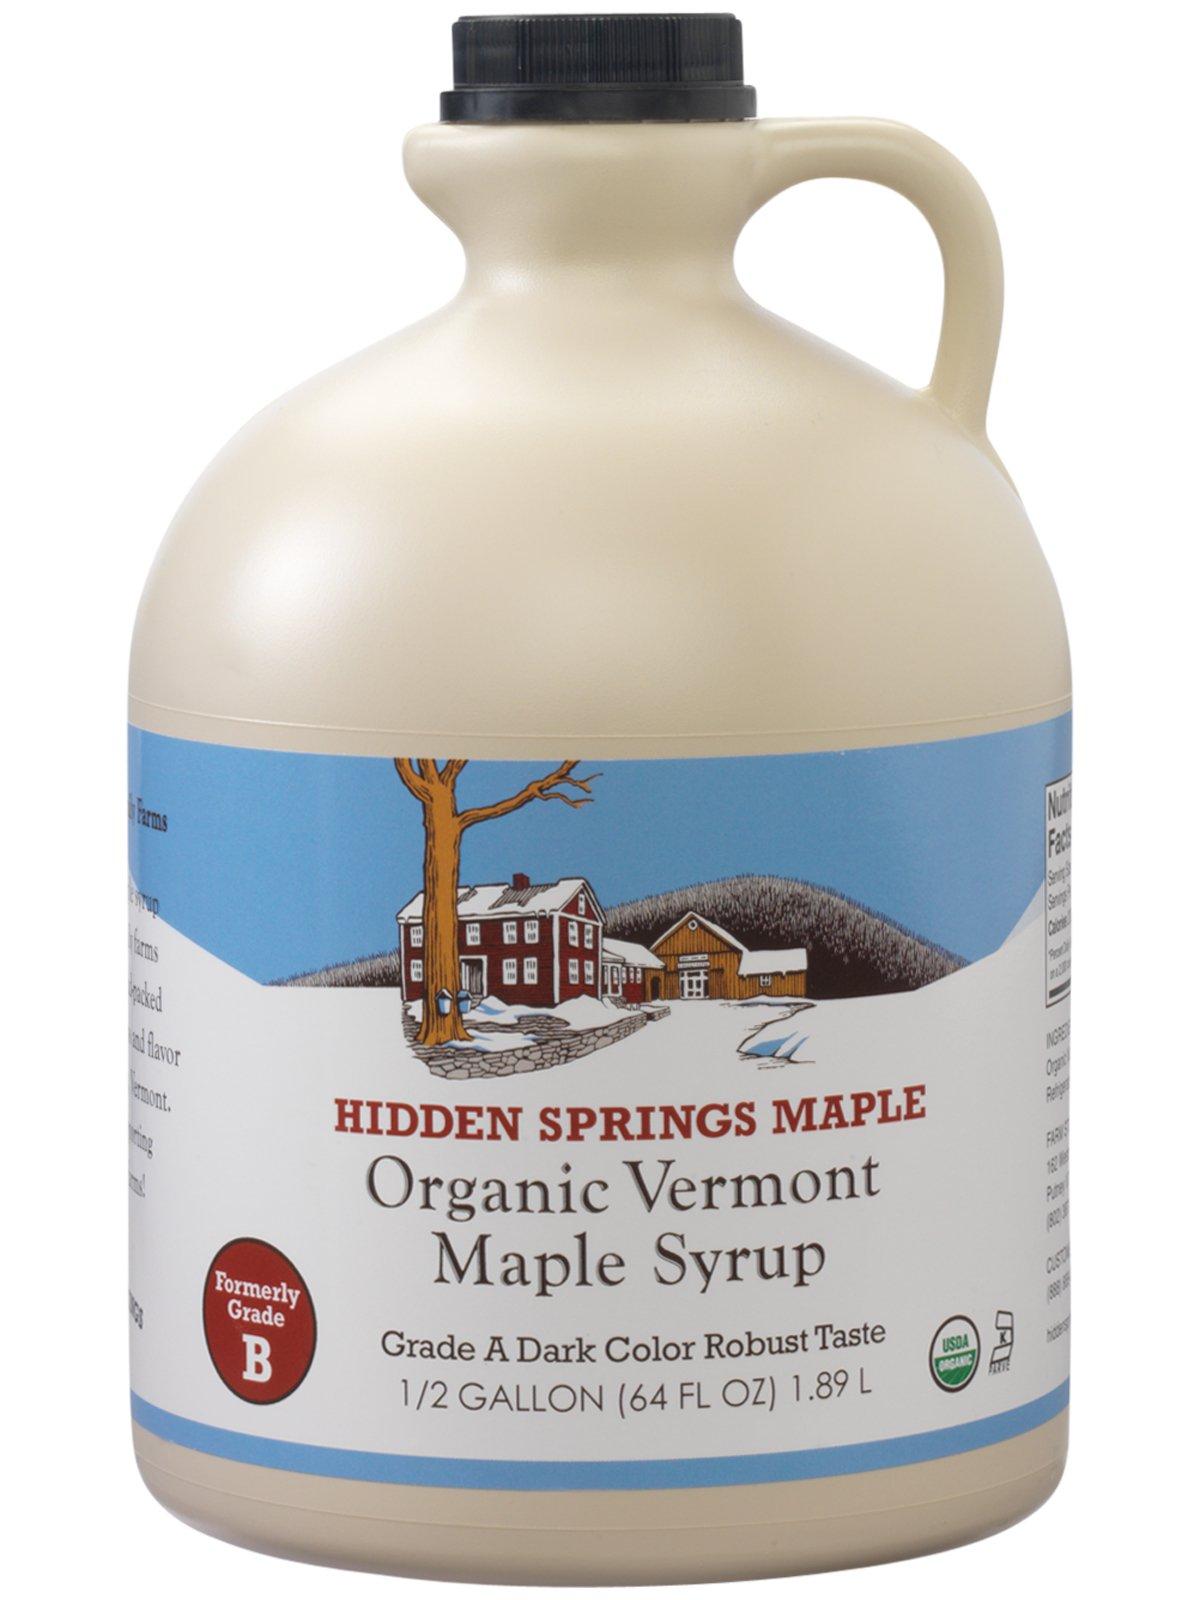 Hidden Springs Organic Vermont Maple Syrup, Grade A Dark Robust (Formerly Grade B), 64 Ounce, 1 Half Gallon, Family Farms, BPA-free Jug